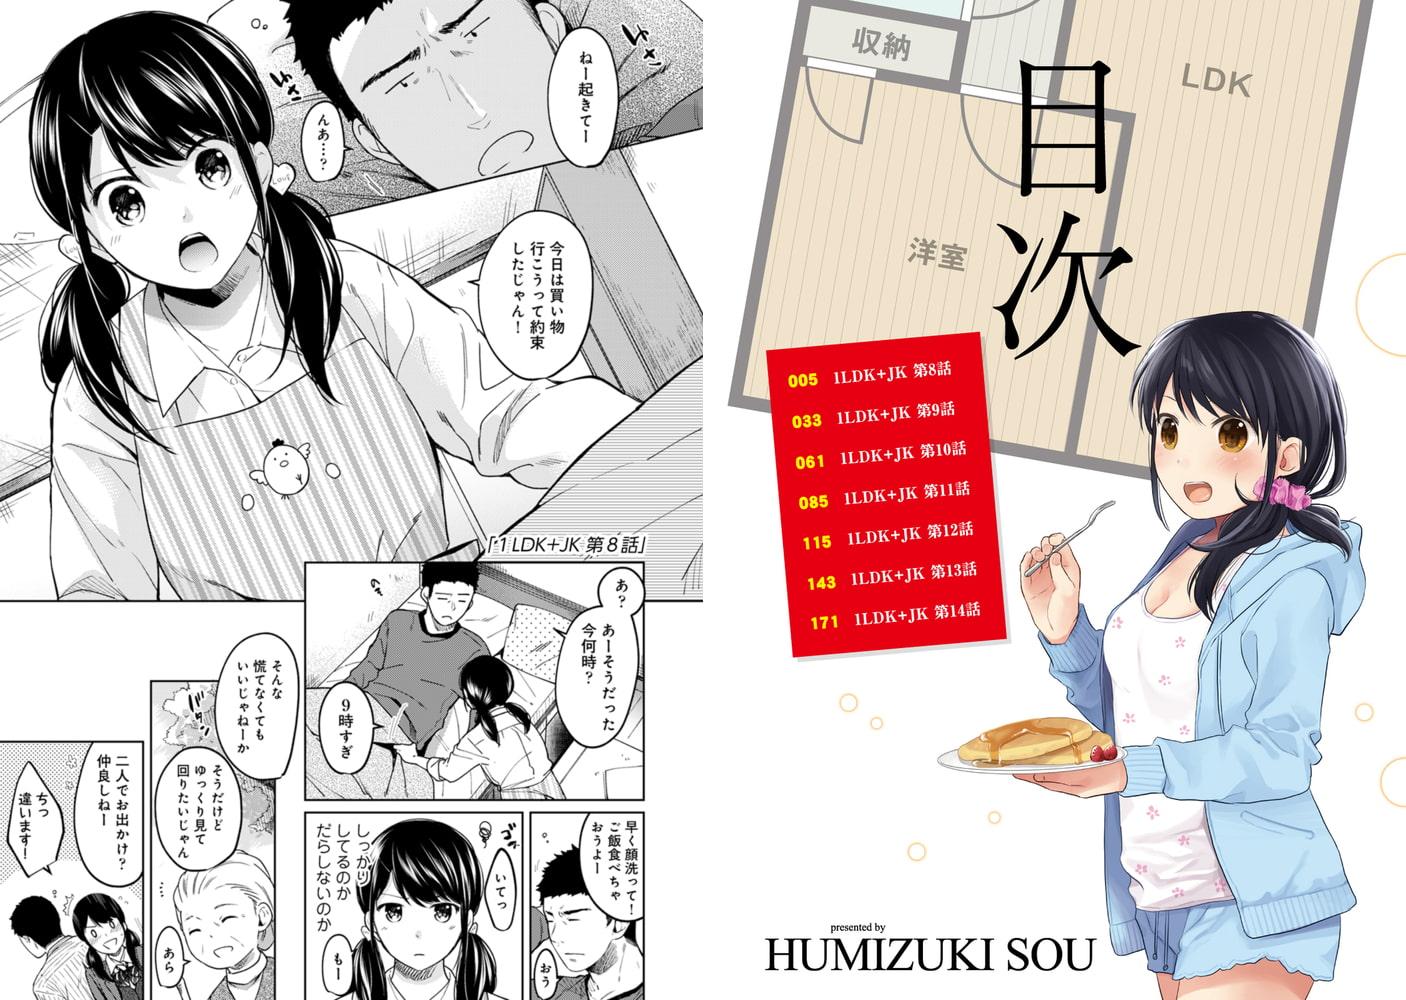 1LDK+JK いきなり同居?密着!?初エッチ!!?第2集【合本版】